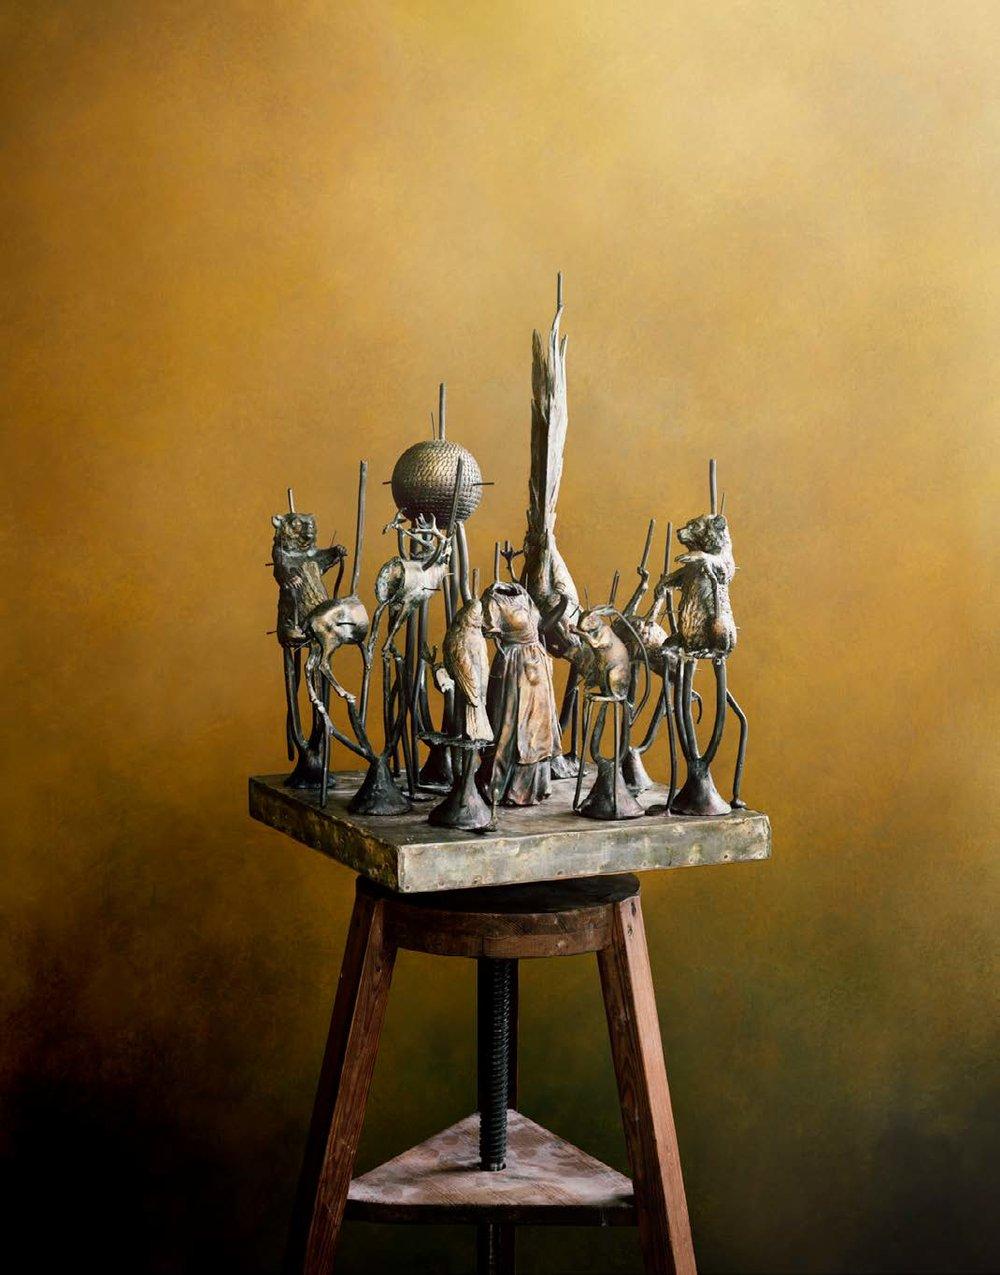 Denise Grünstein   The Cast, 2018  Skulpturgrupp på kavalett  165 x 38 x 38 cm Edition 3